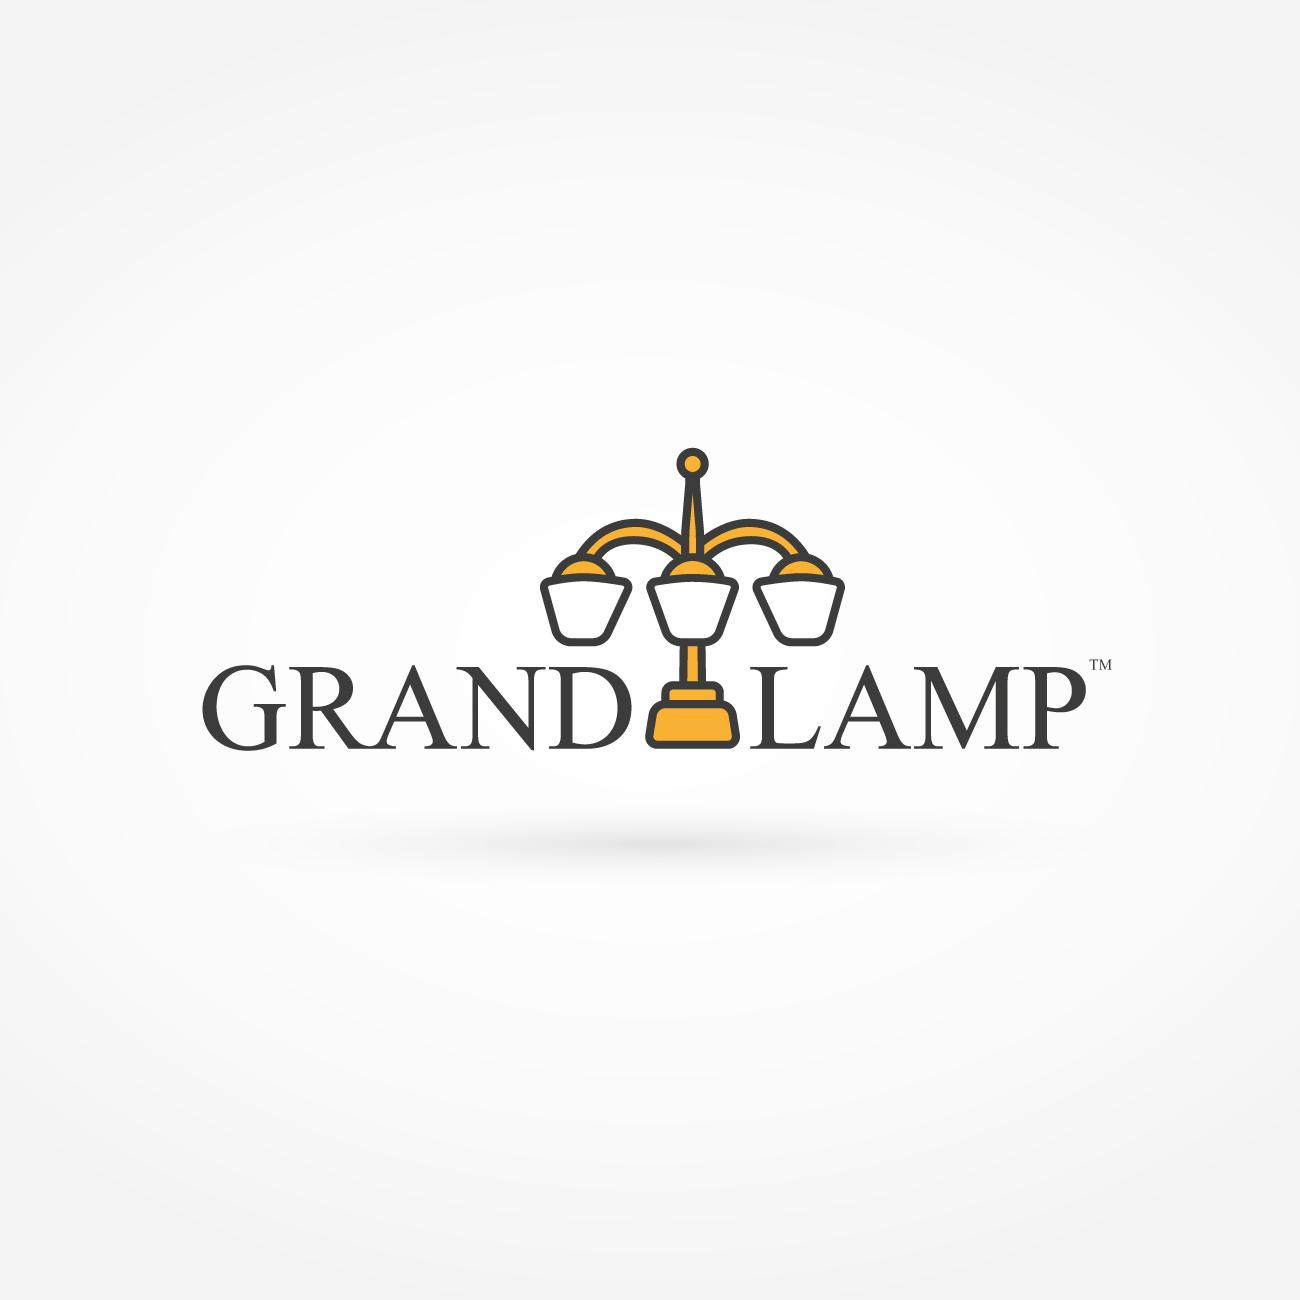 Разработка логотипа и элементов фирменного стиля фото f_58957ec4d5f80851.jpg